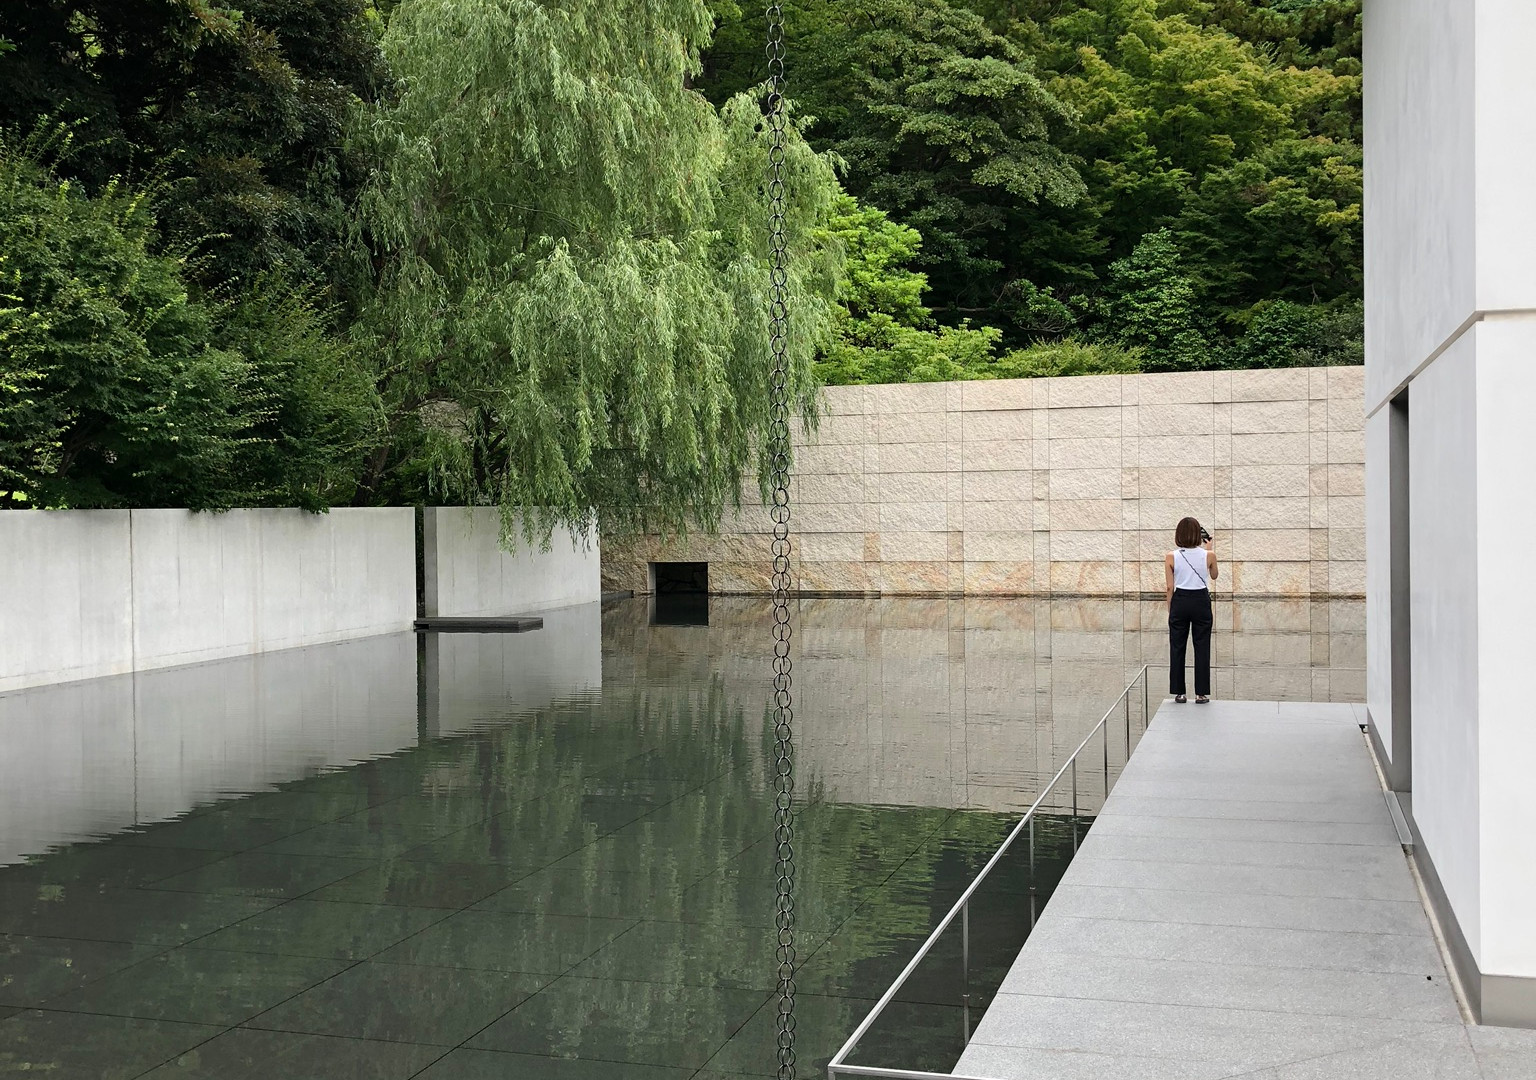 D.T. Suzuki Museum; designed by Yoshio Taniguchi